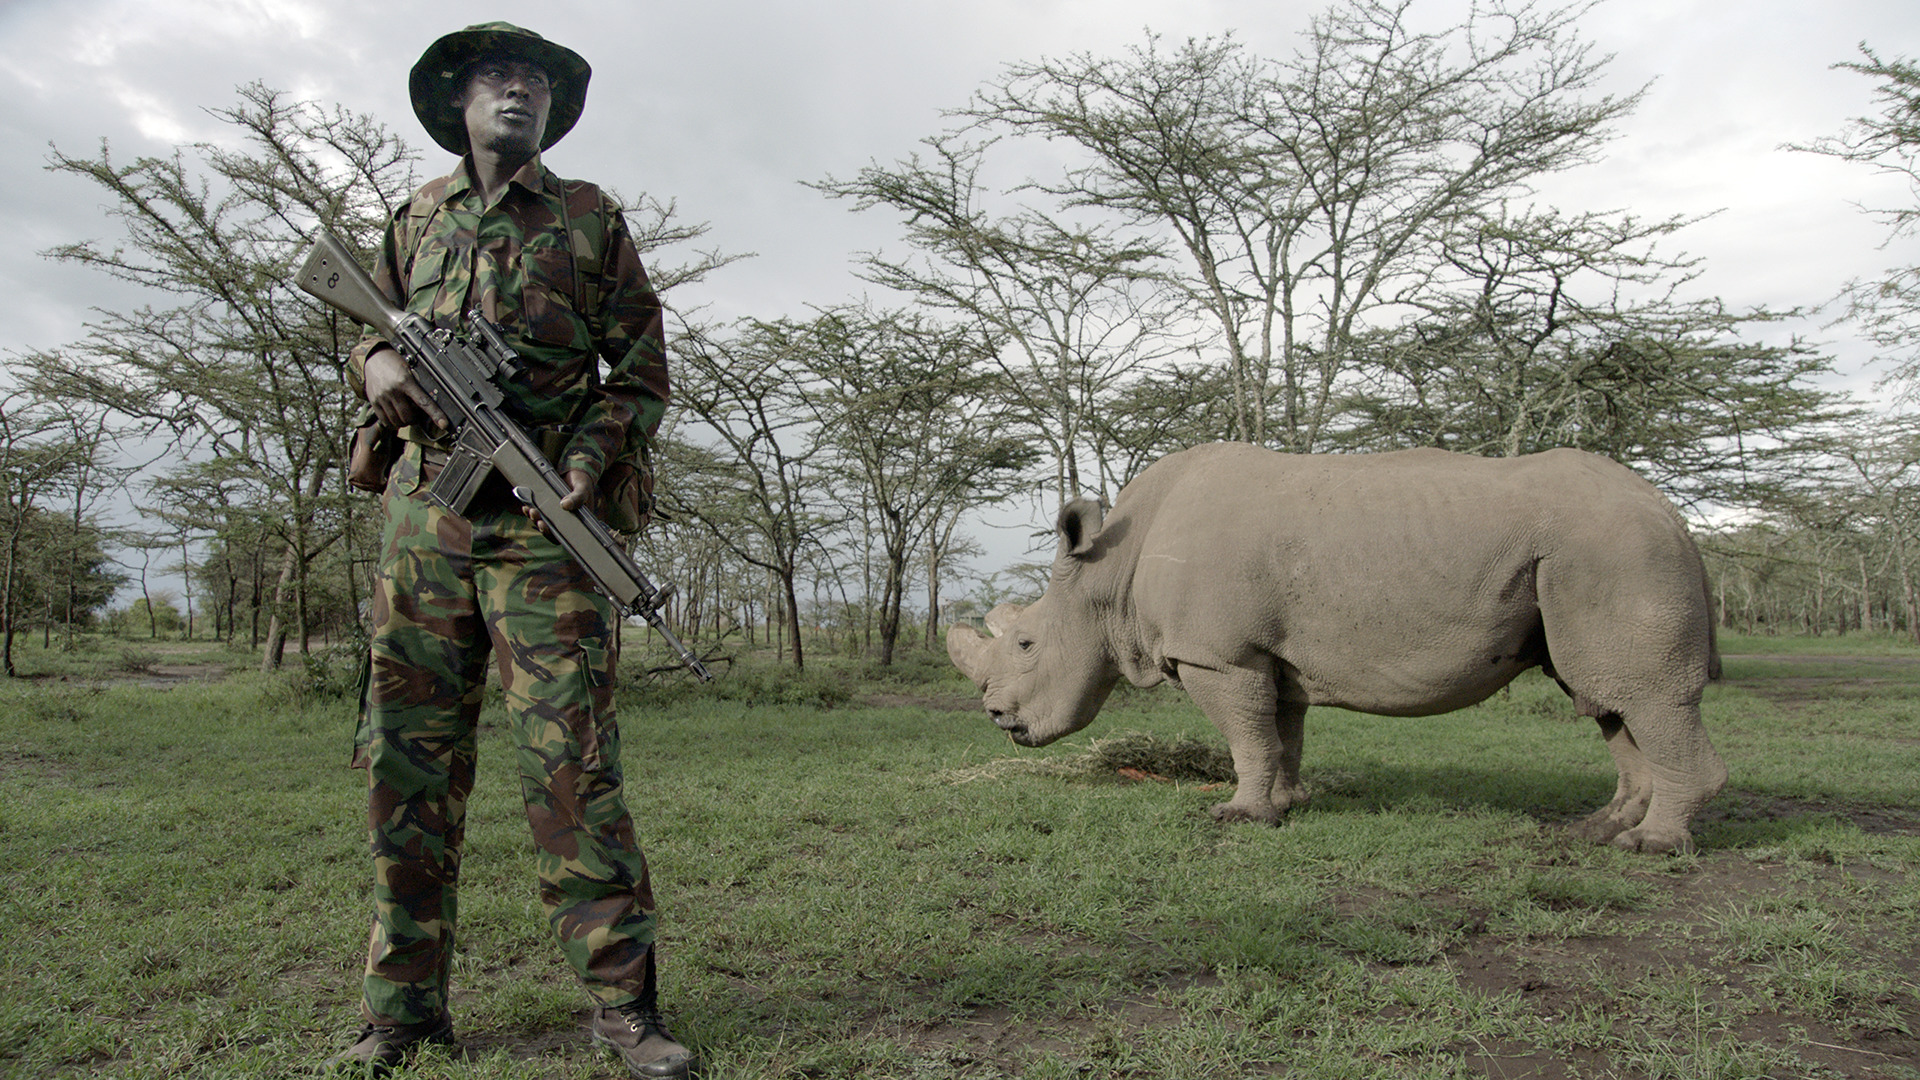 Rinoceronte bianco nella riserva keniota di Ol pejeta. Film Still